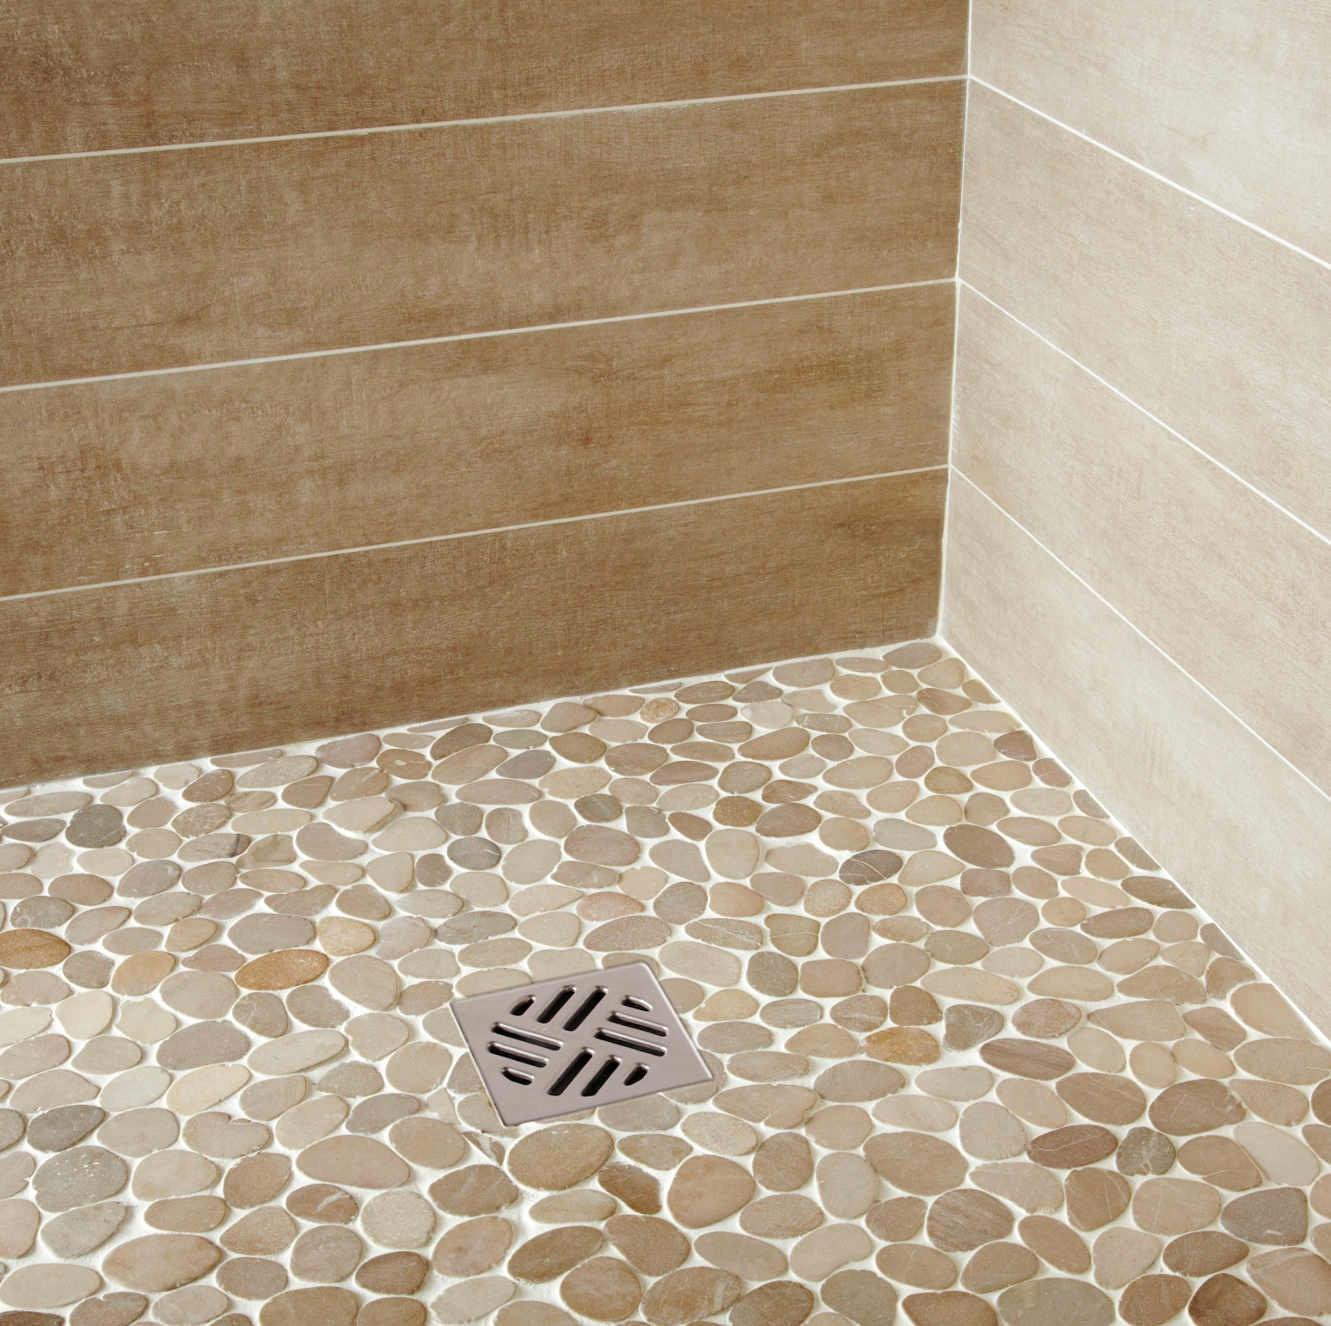 carrelage salle de bain brico depot genial meuble sdb brico depot miroir salle de bain brico depot fimm of carrelage salle de bain brico depot